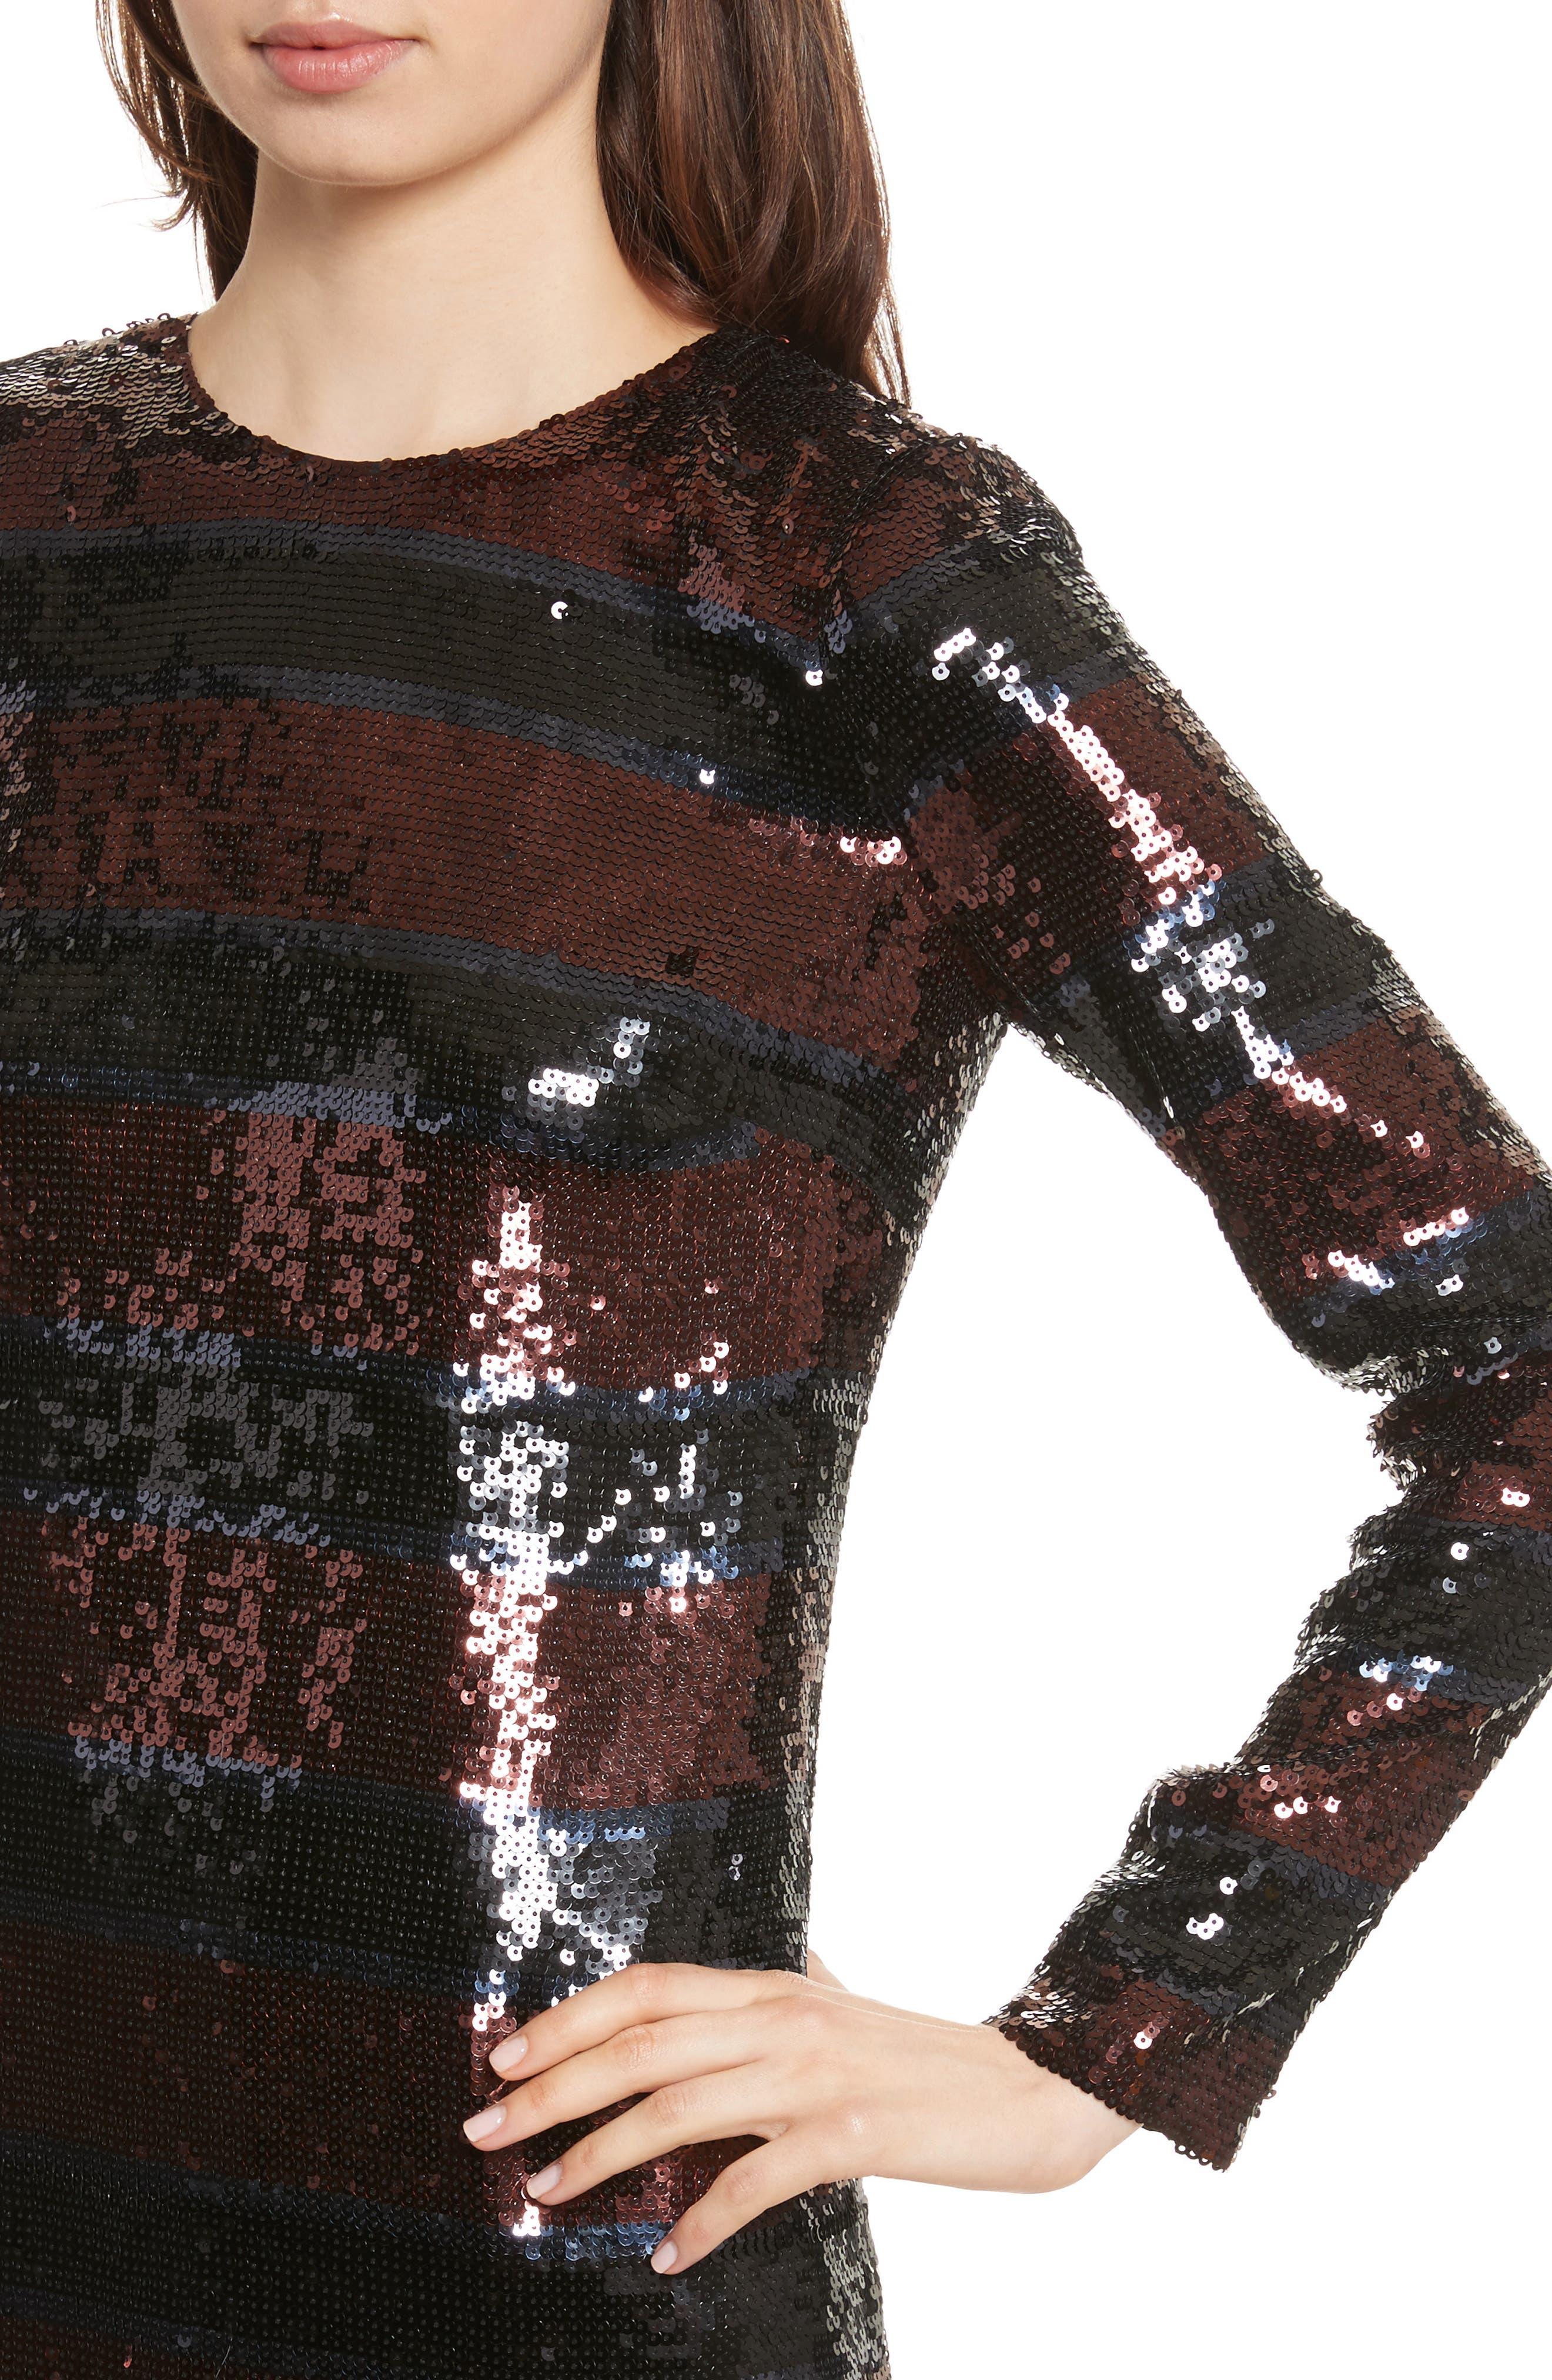 Breakers Sequin Dress,                             Alternate thumbnail 4, color,                             931